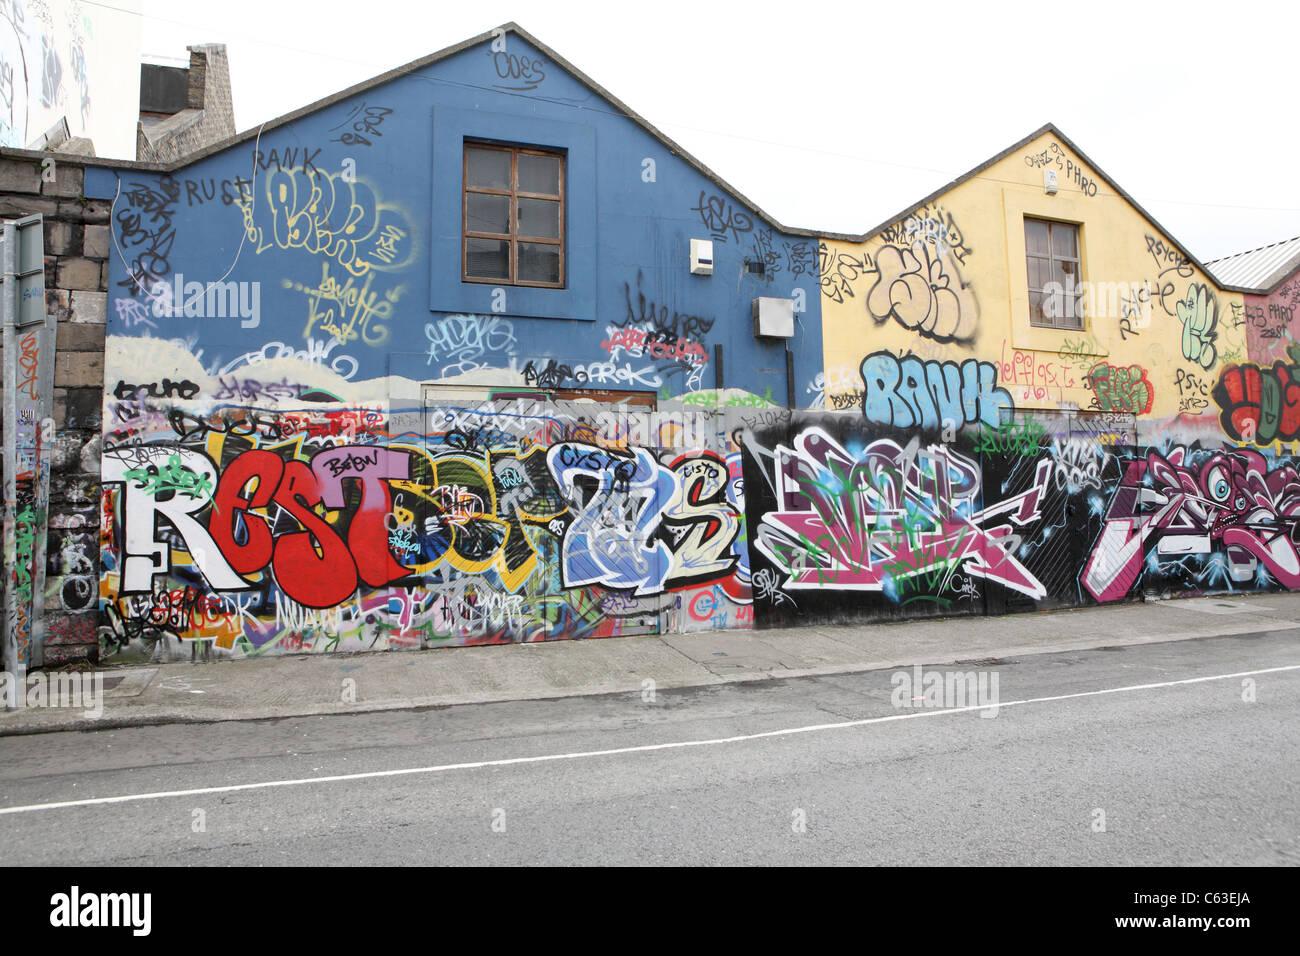 Graffiti wall dublin - Graffiti In Windmill Lane Dublin